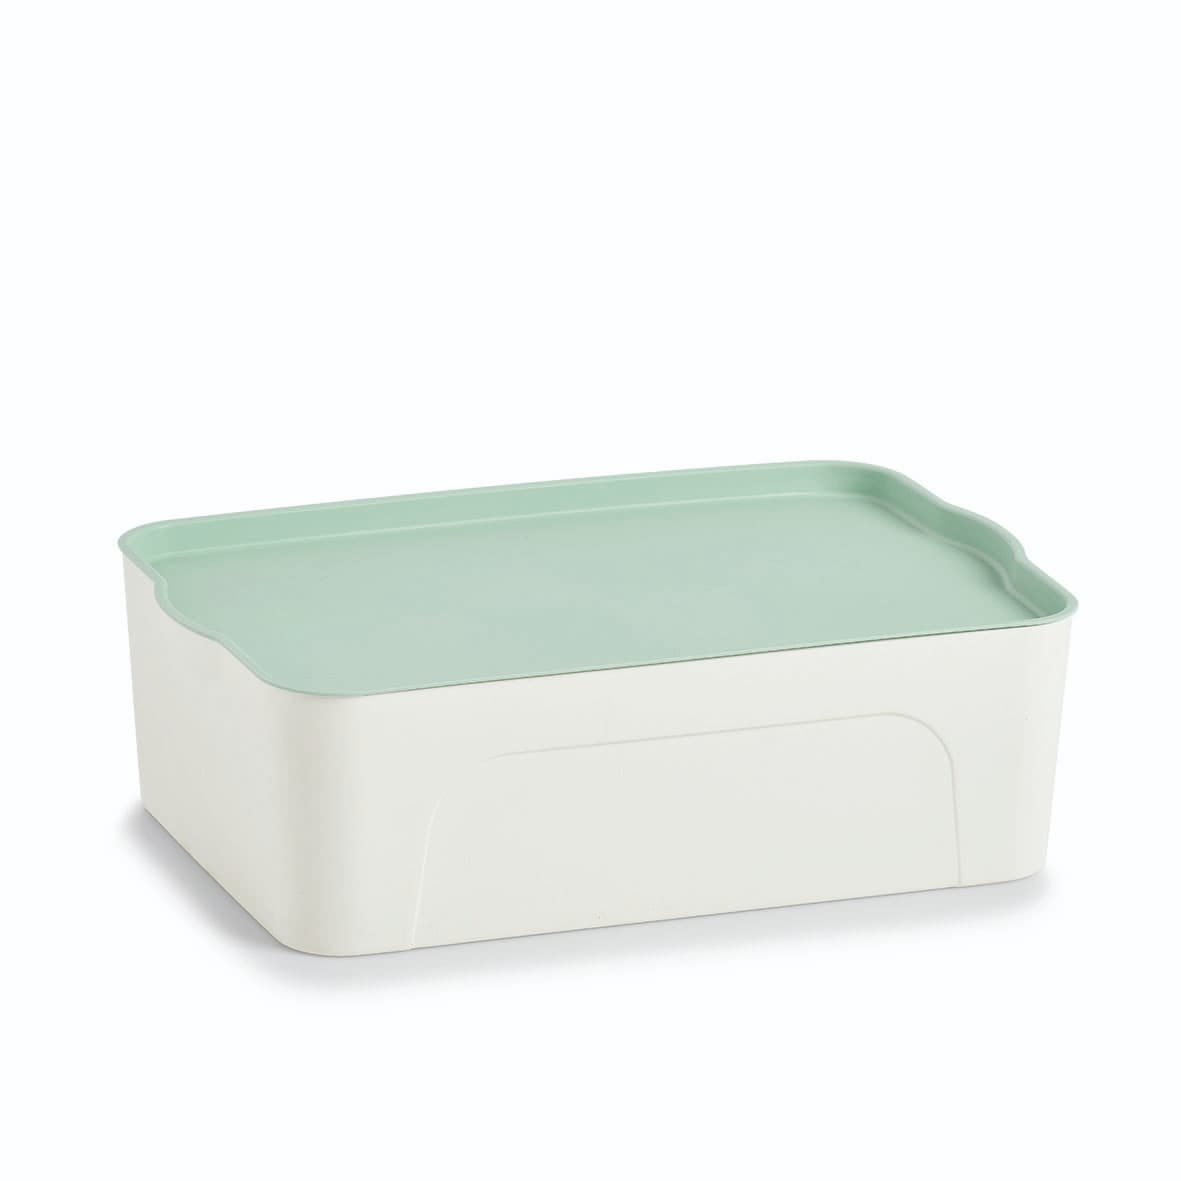 Cutie pentru depozitare din plastic, Lid II Alb / Verde Mint, L44,5xl30xH14 cm